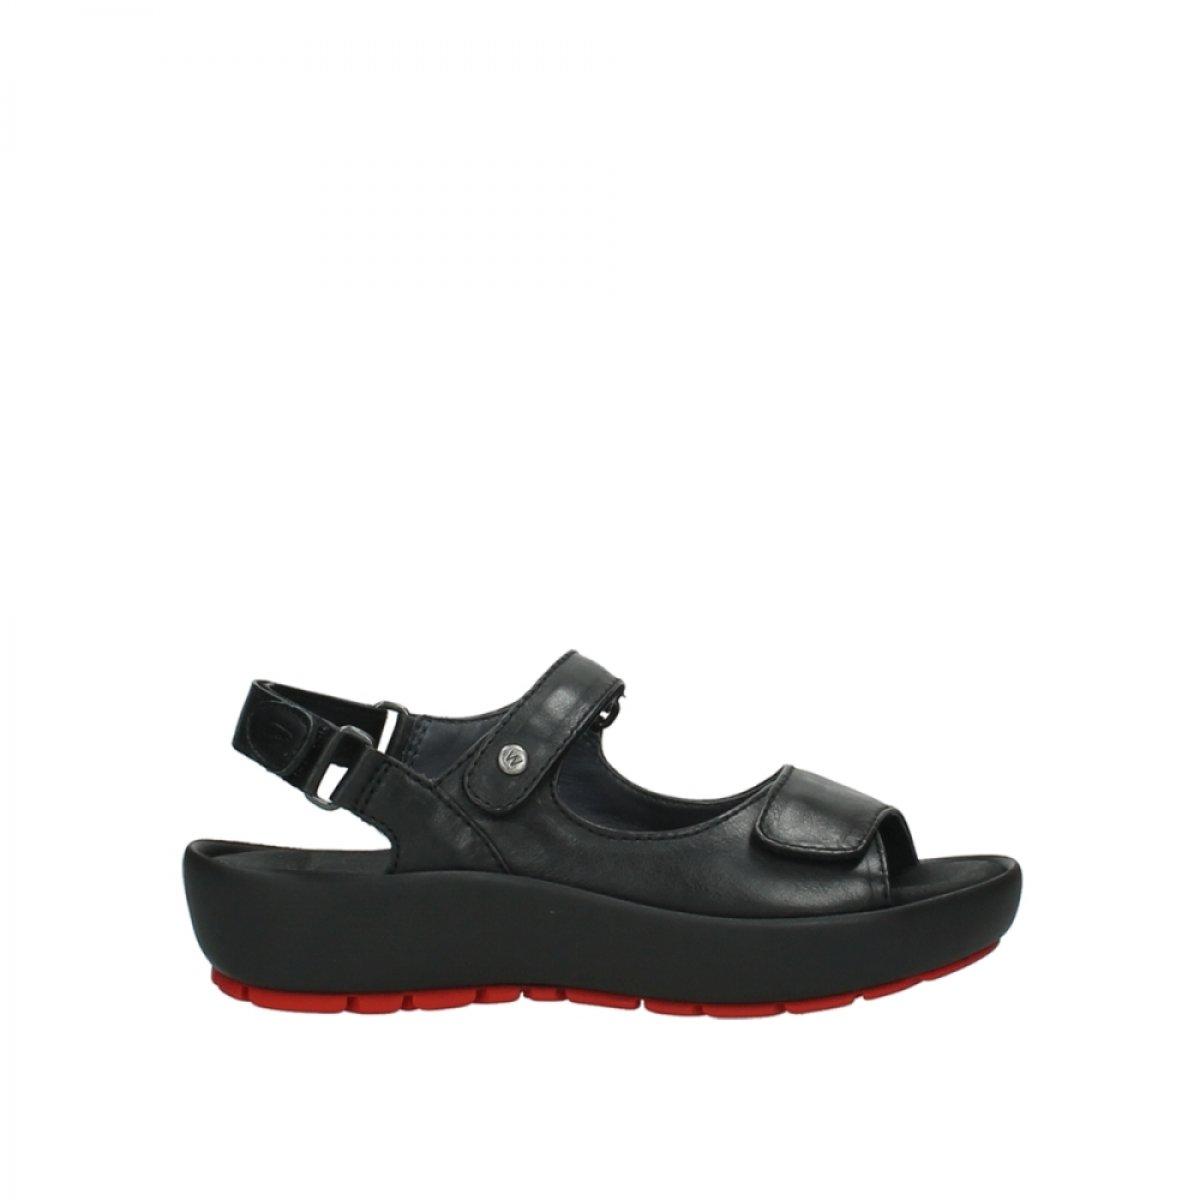 Wolky Comfort Rio B007OANLIC 36 M EU|20000 Black Leather